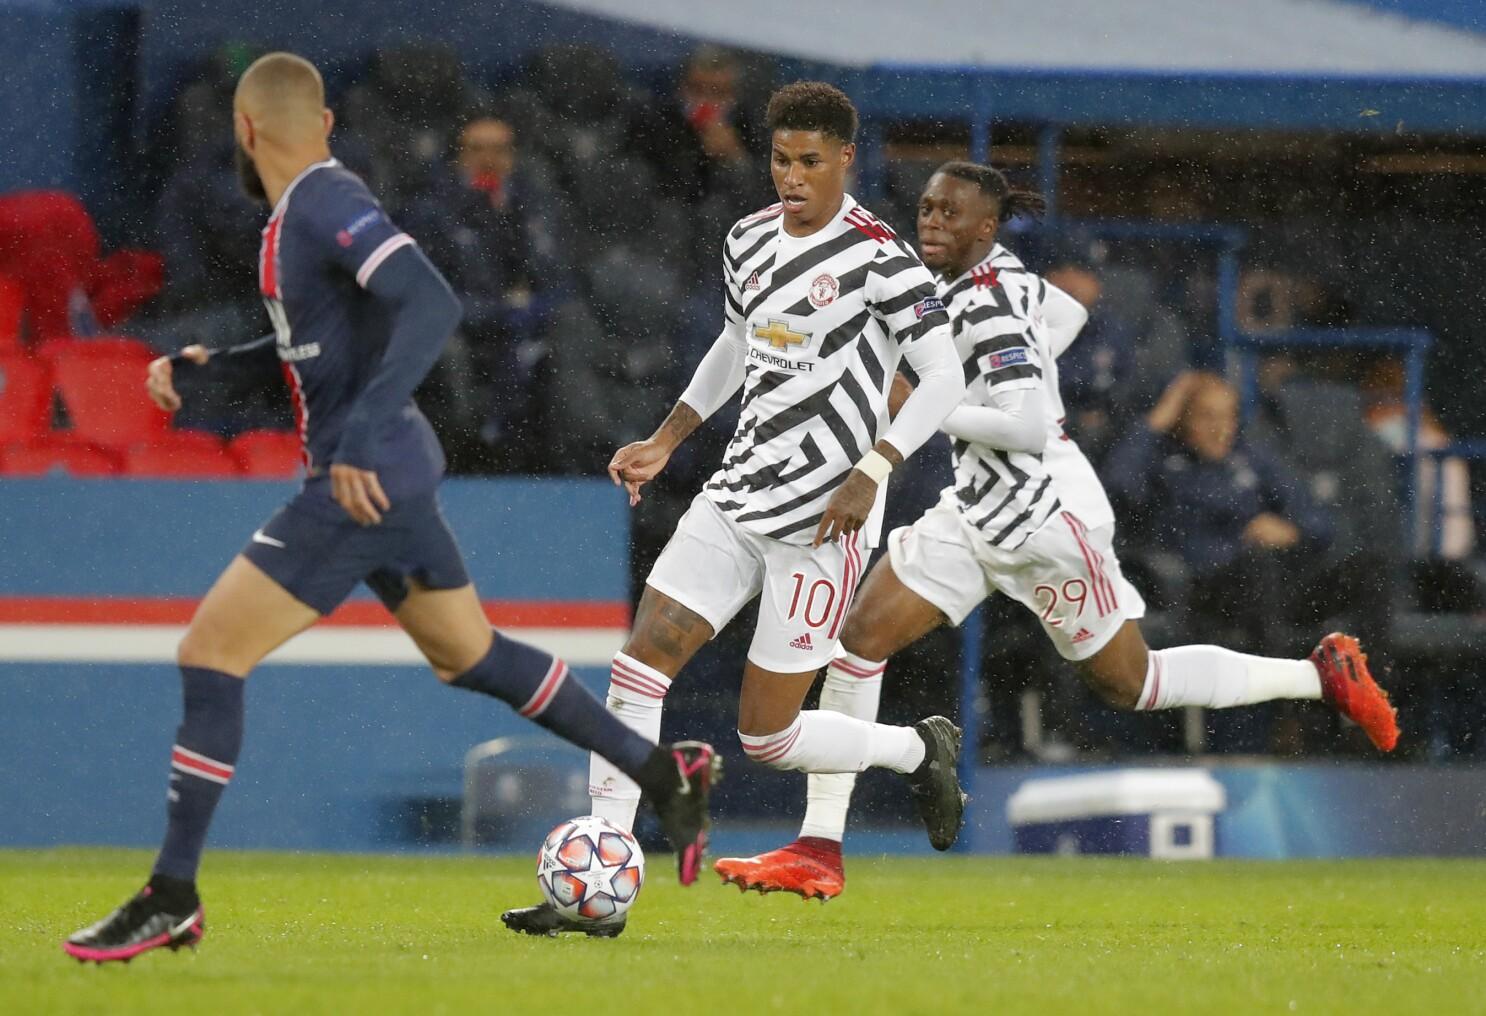 Deja Vu Rashford Haunts Psg As United Wins 2 1 In Paris The San Diego Union Tribune